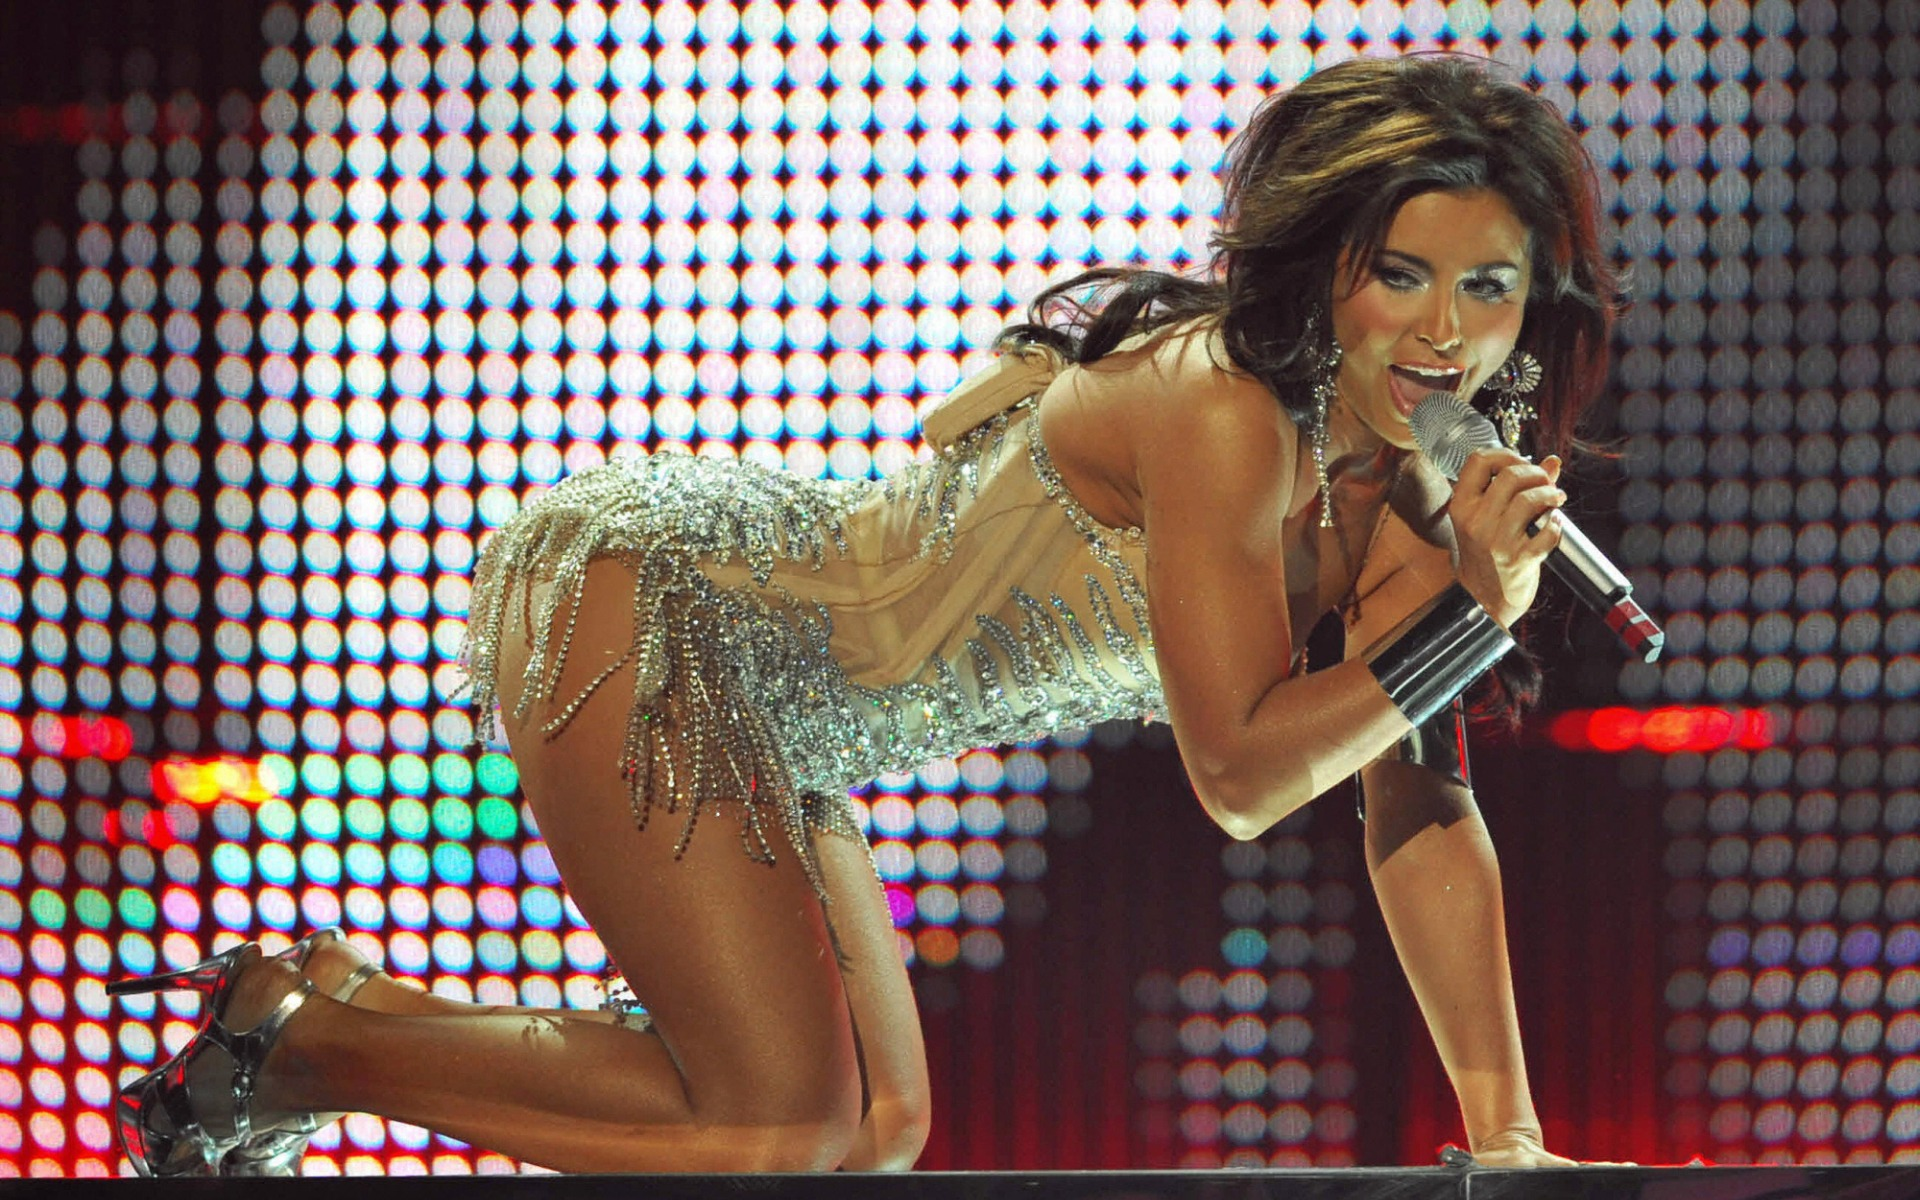 Рис. 2. Евровидение-2008